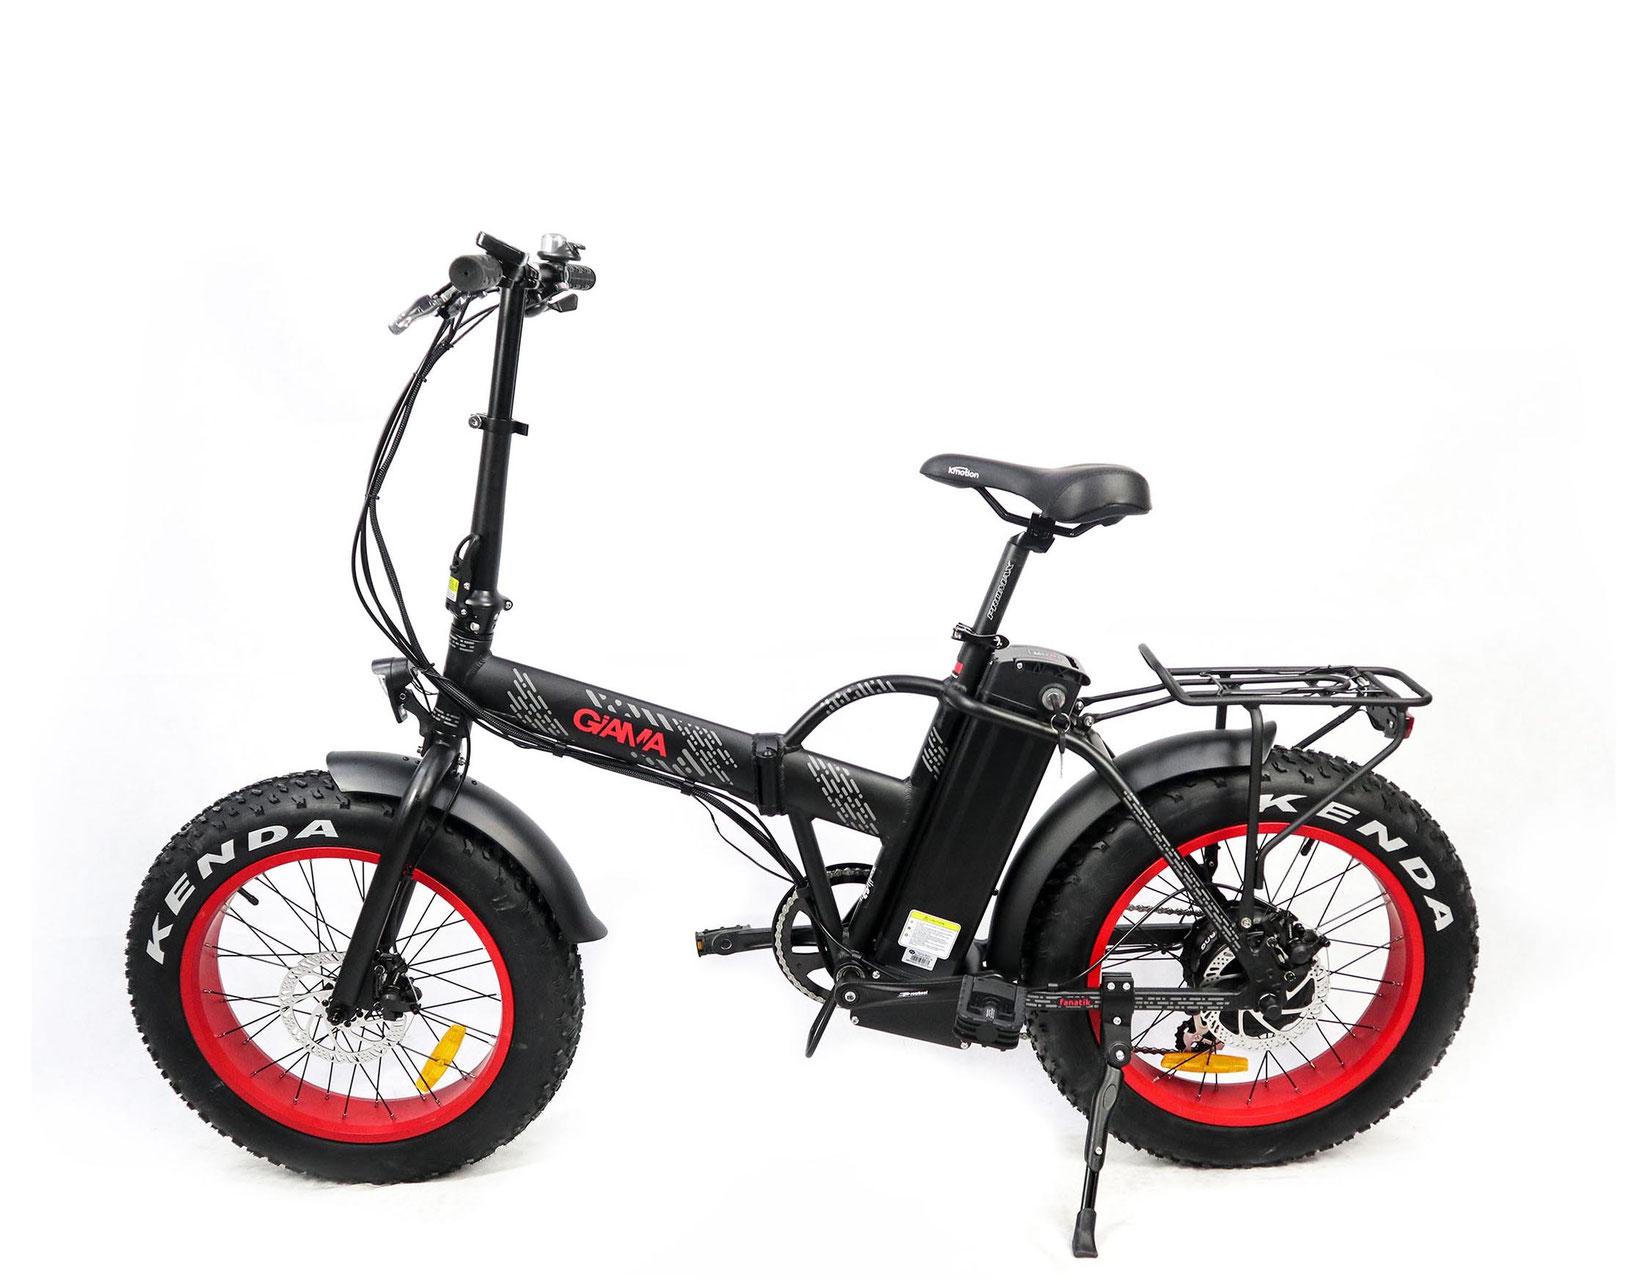 E Bike Varie Everyshopeu Everyshop Every Shop Prodotti